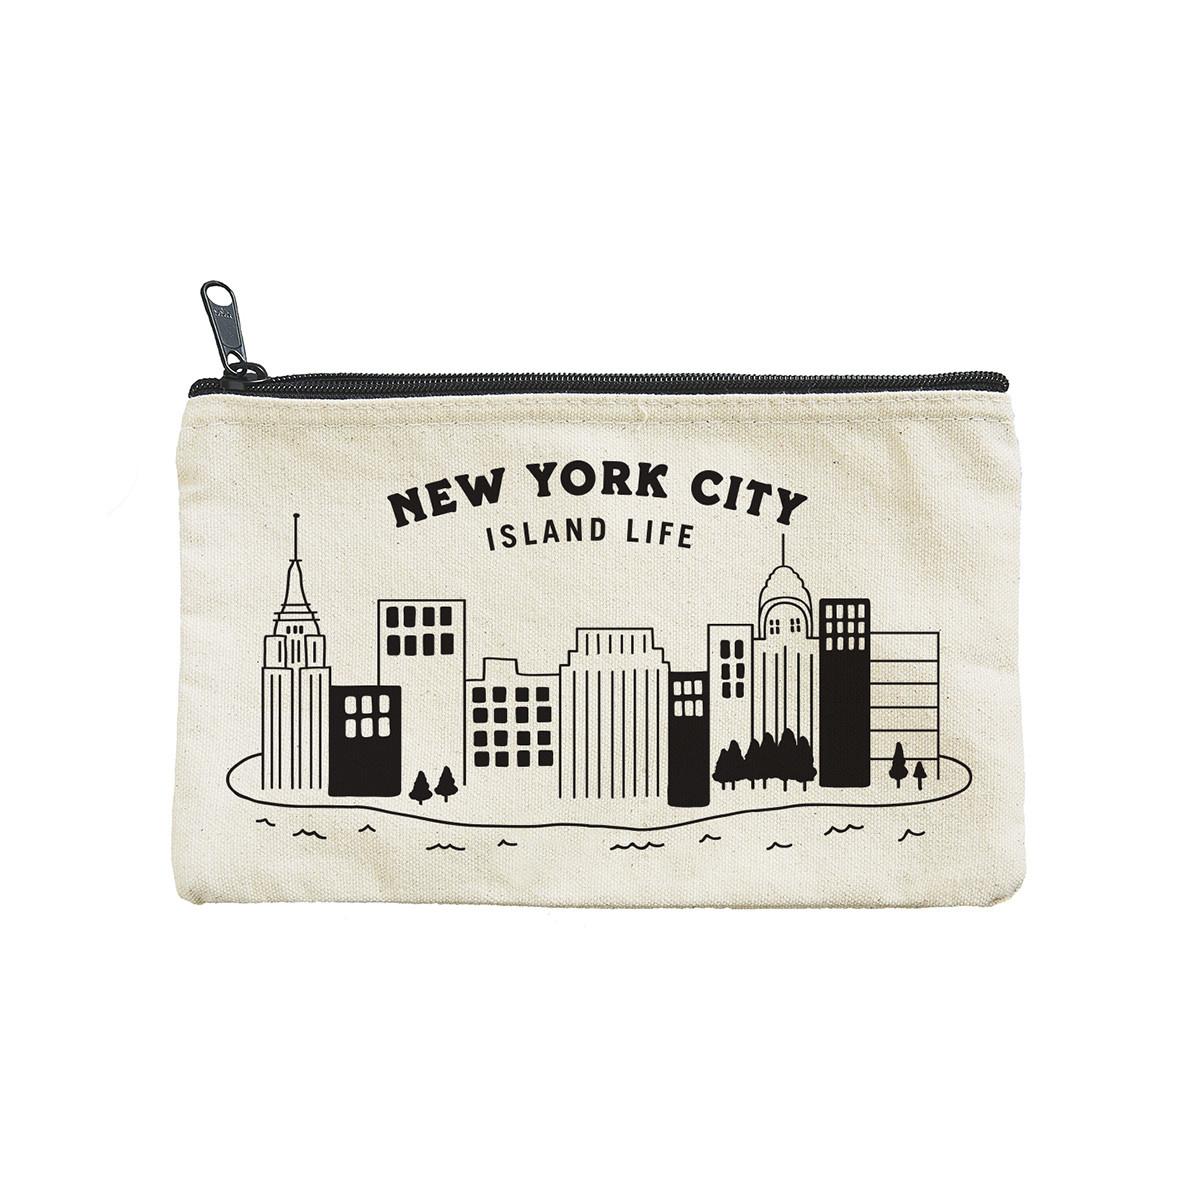 Seltzer Zip Pouch - NY Island Life